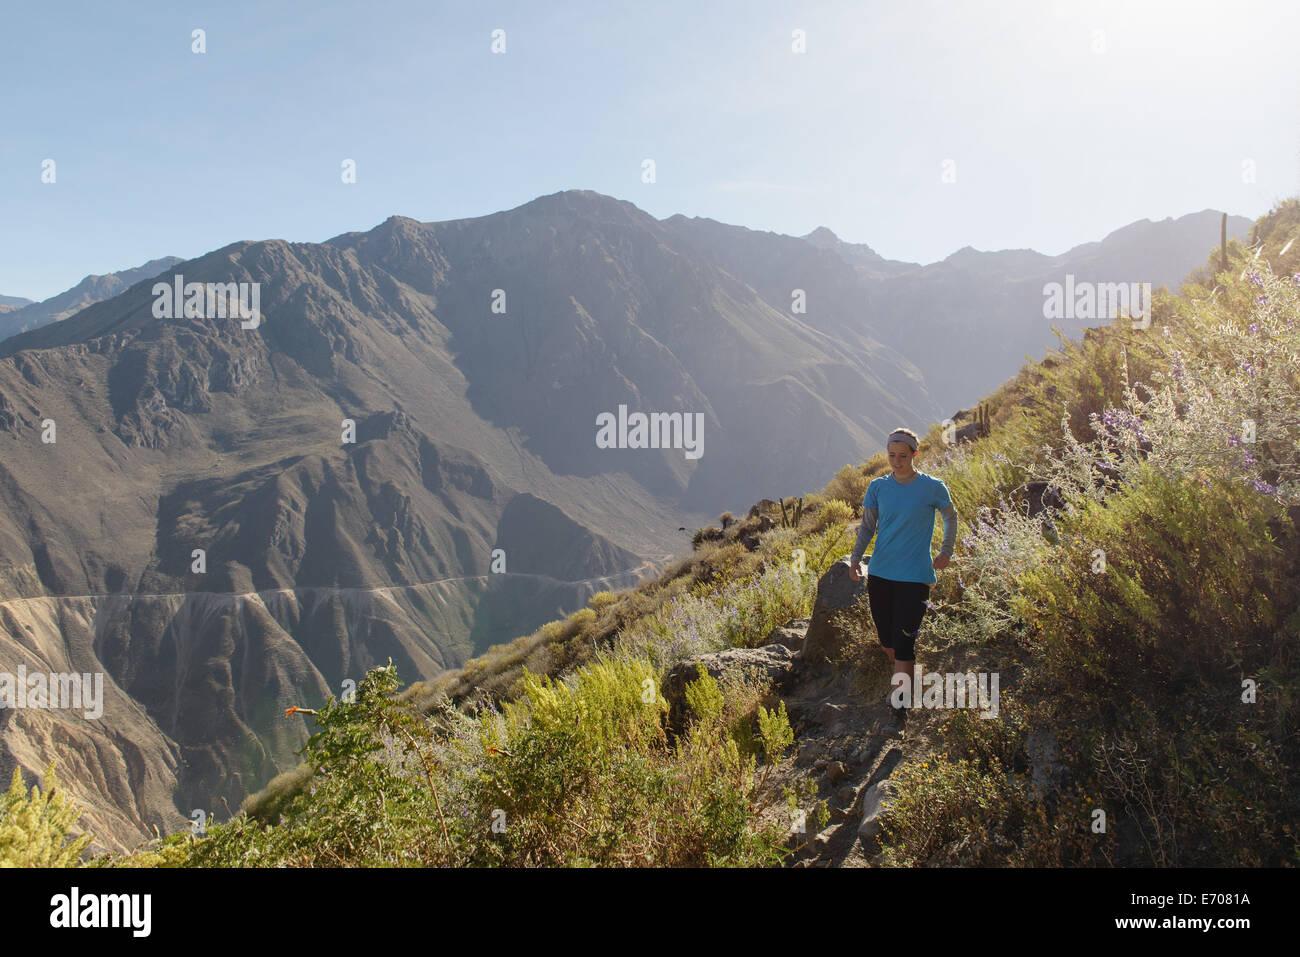 Young woman jogging in Colca Canyon, Cabanaconde, Peru - Stock Image